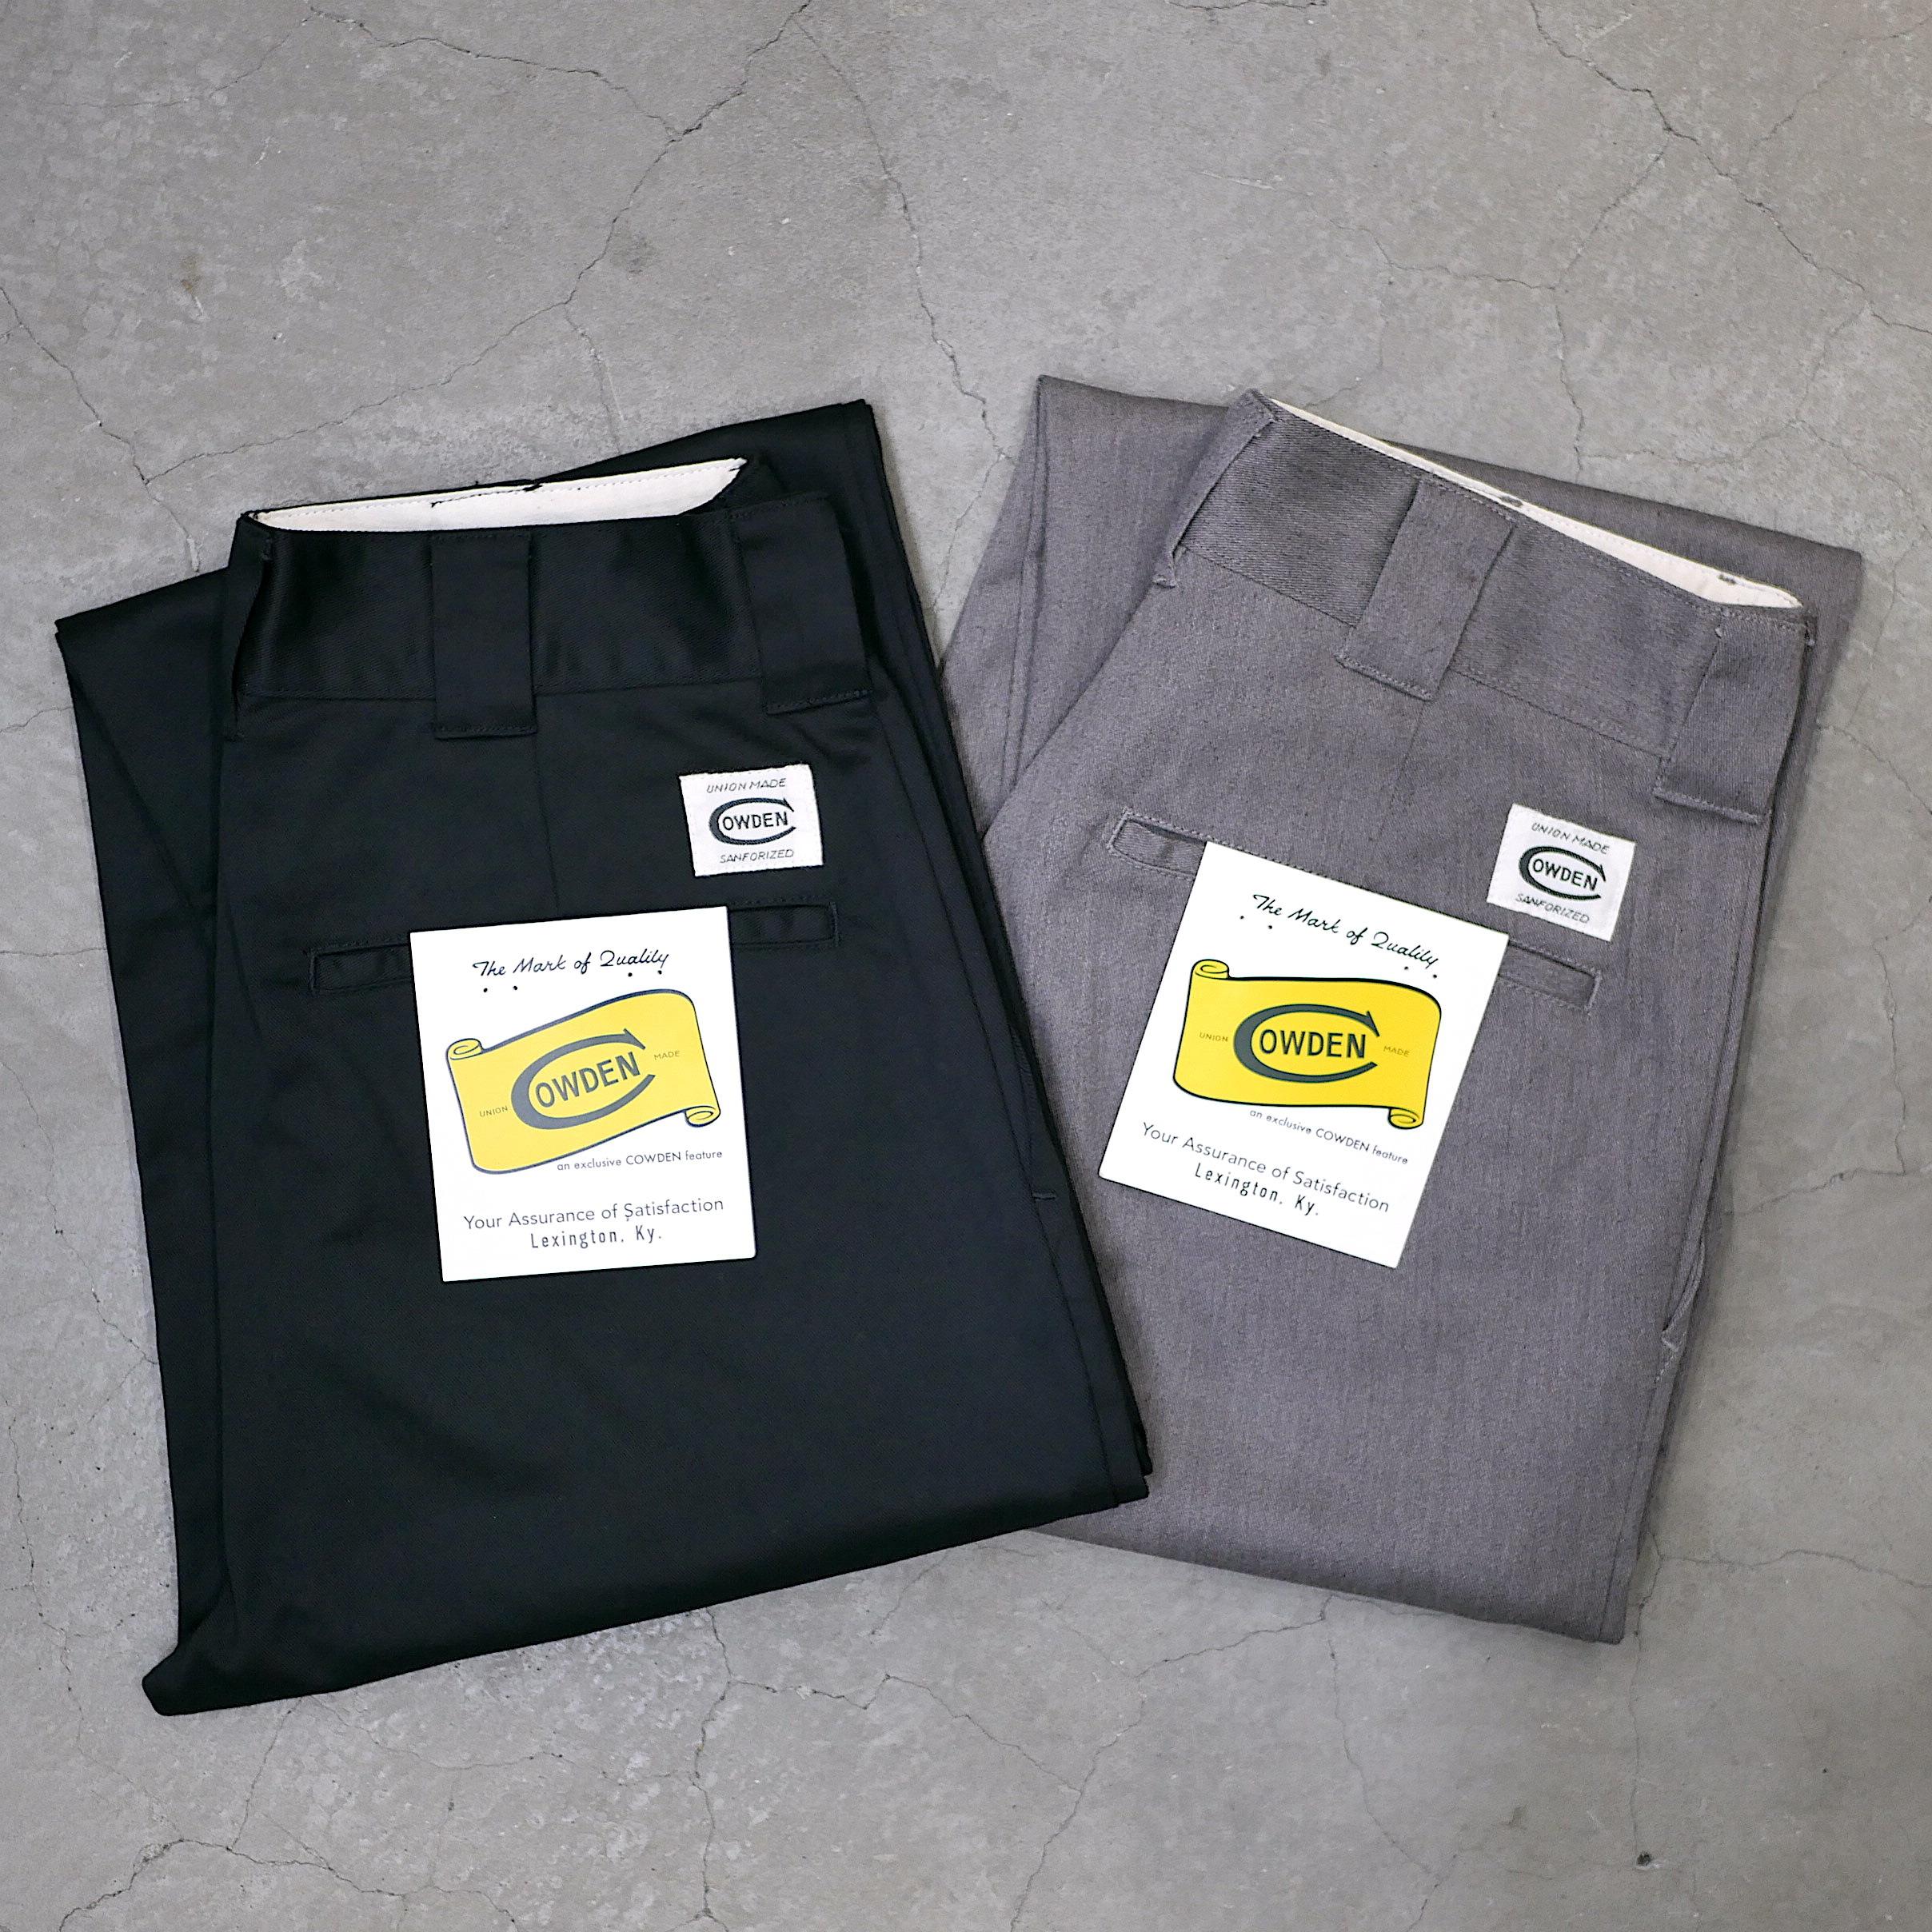 COWDEN / STRAIGHT WORK PANTS